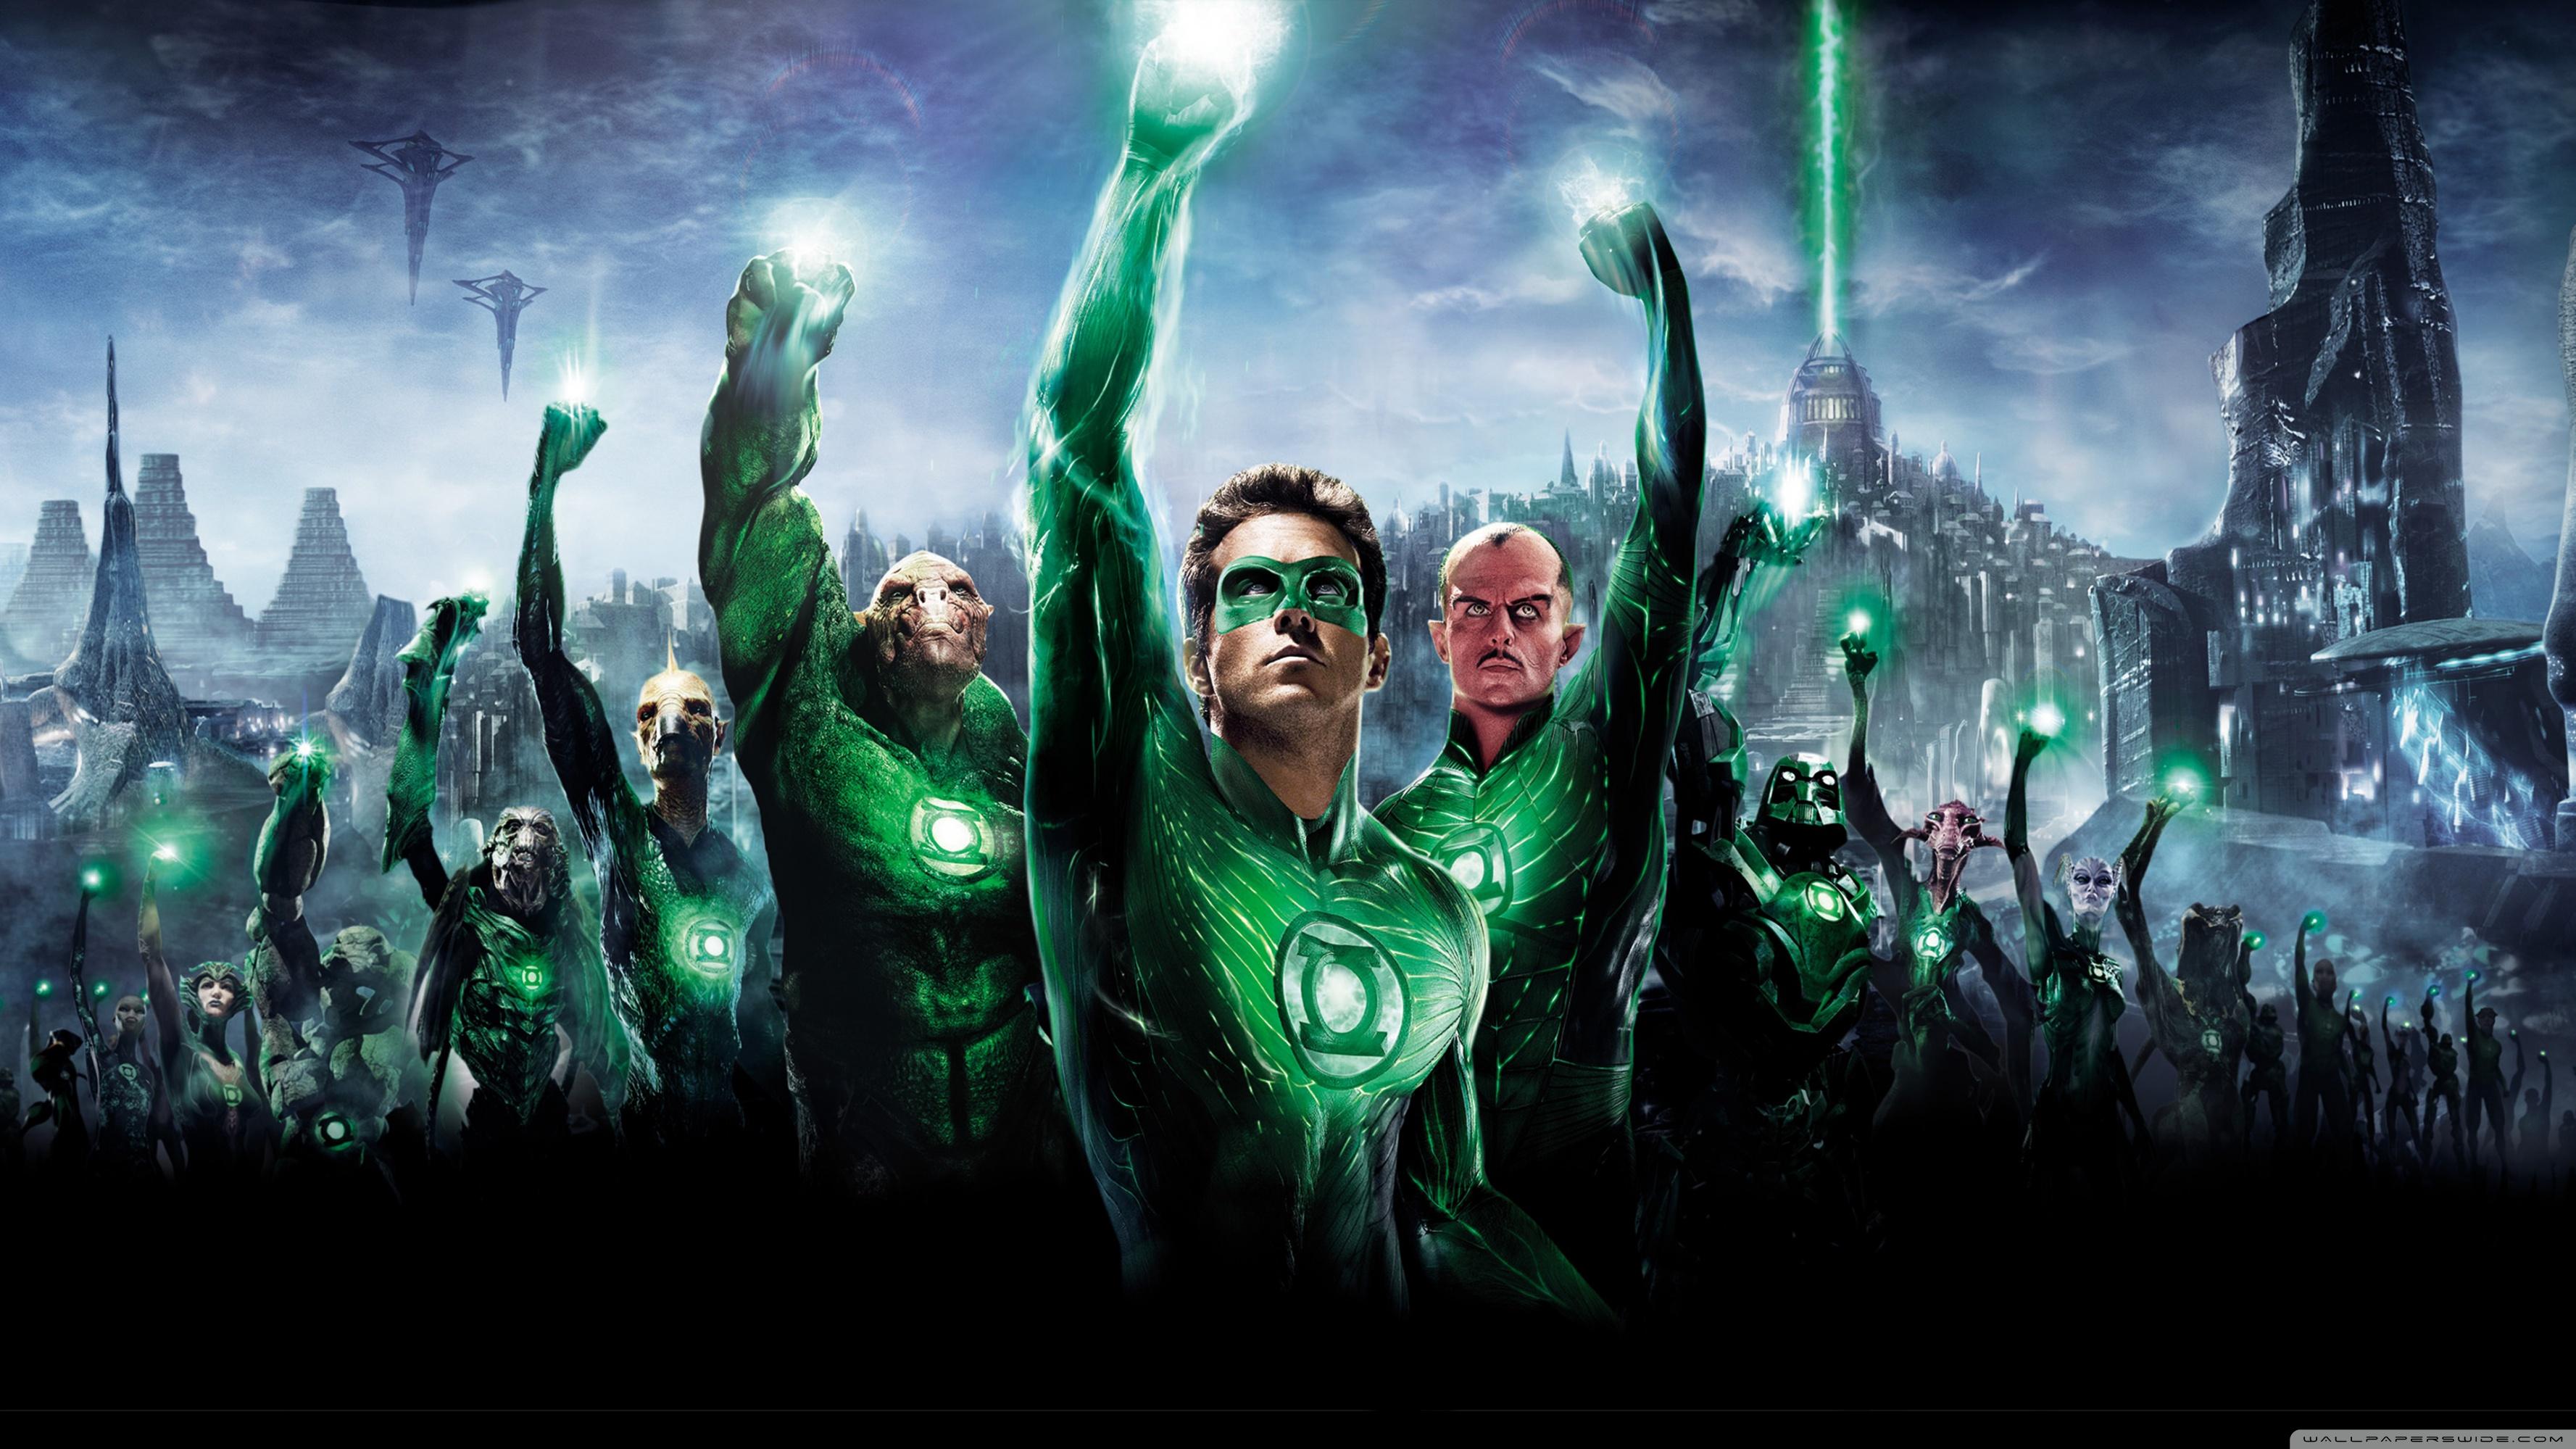 Green Lantern Movie 2011 4K HD Desktop Wallpaper for 4K Ultra 3554x1999